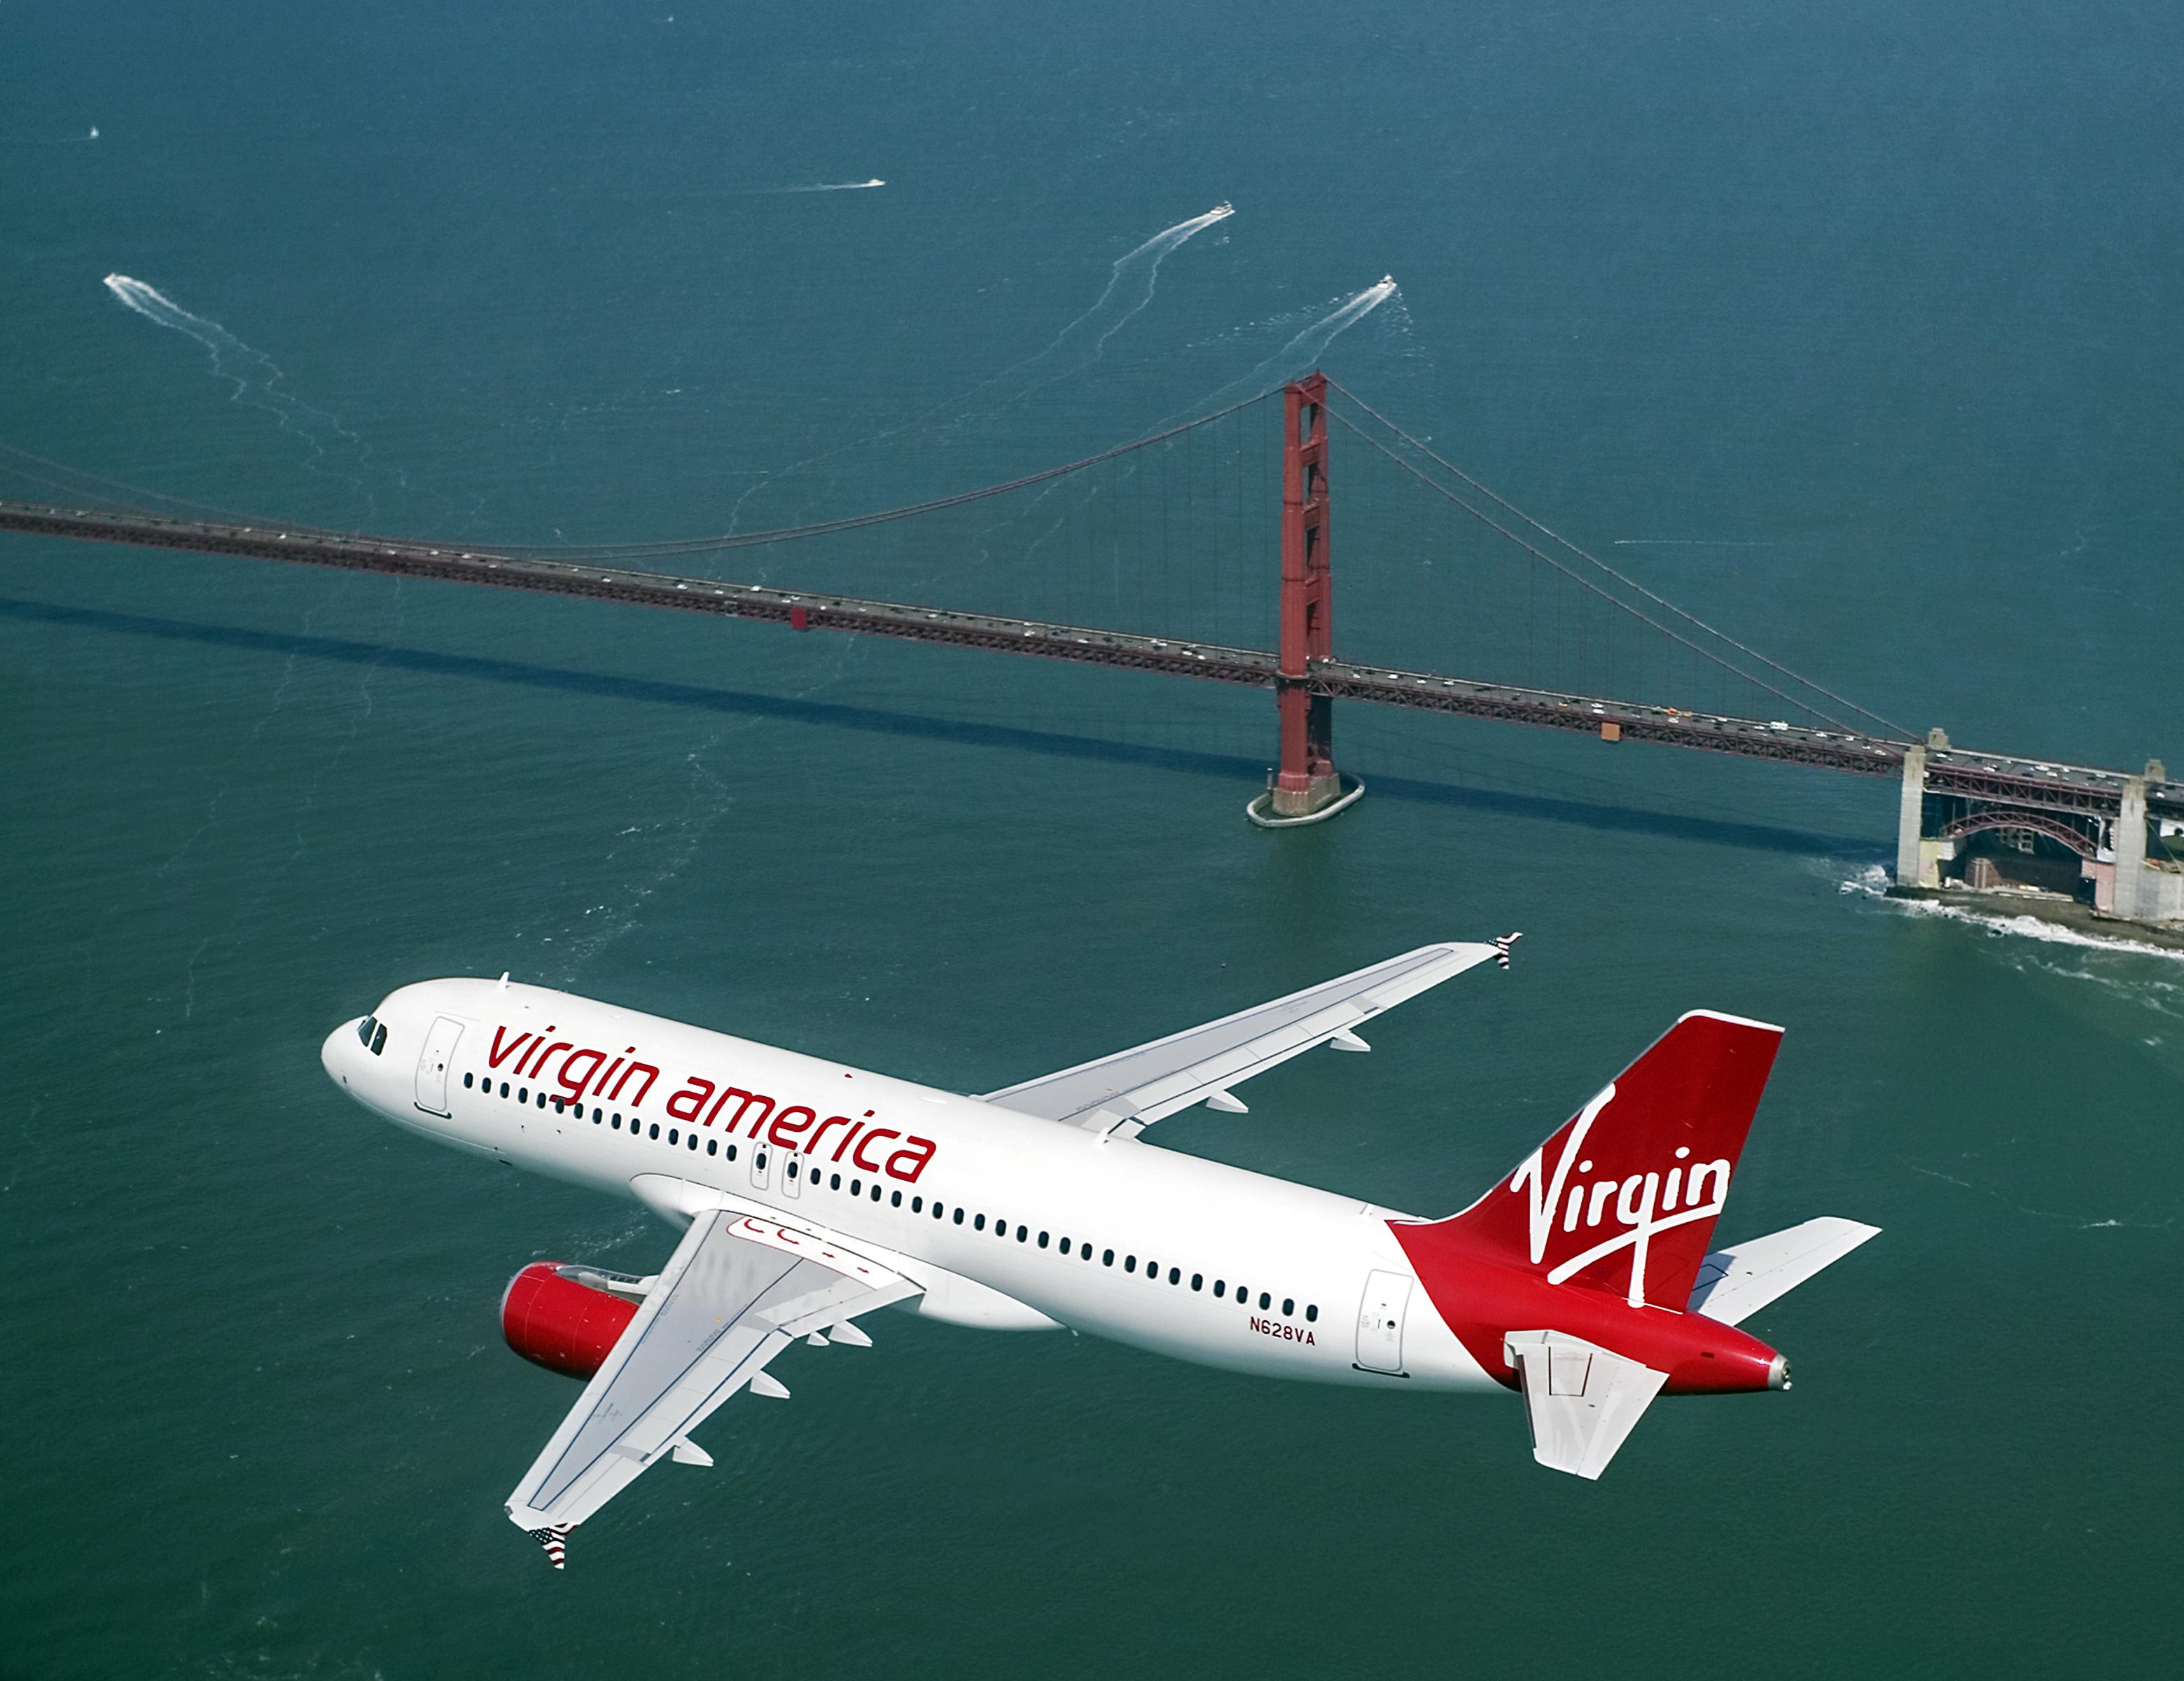 Virgin America Airline 36